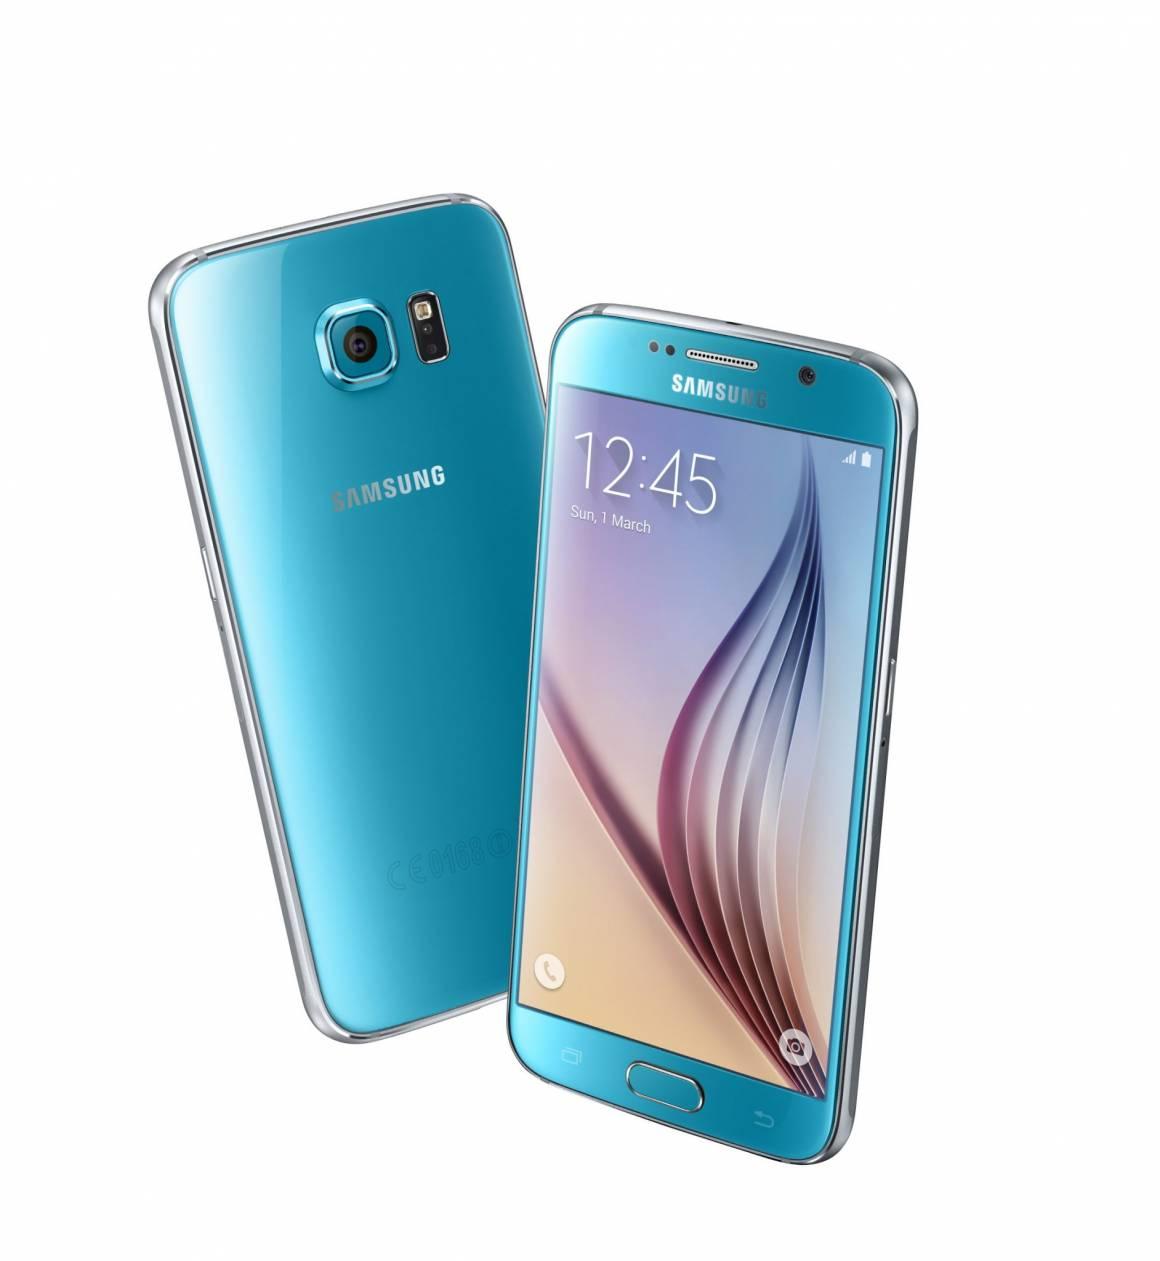 Galaxy S6 Blue Topaz 1160x1261 - Galaxy S6 e Galaxy S6 edge sbarcano in Italia